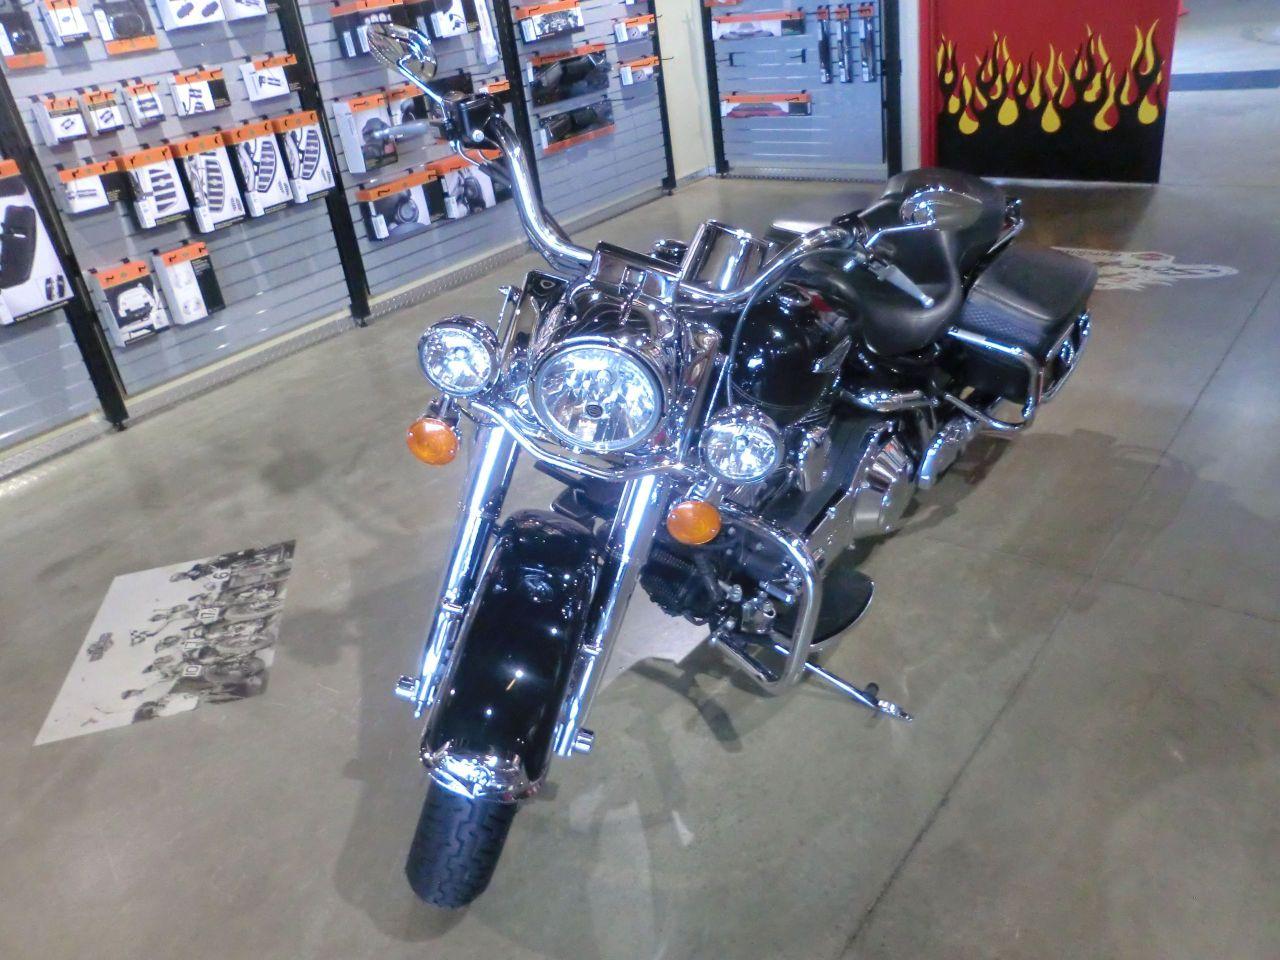 2005 Harley-Davidson FLHRCl